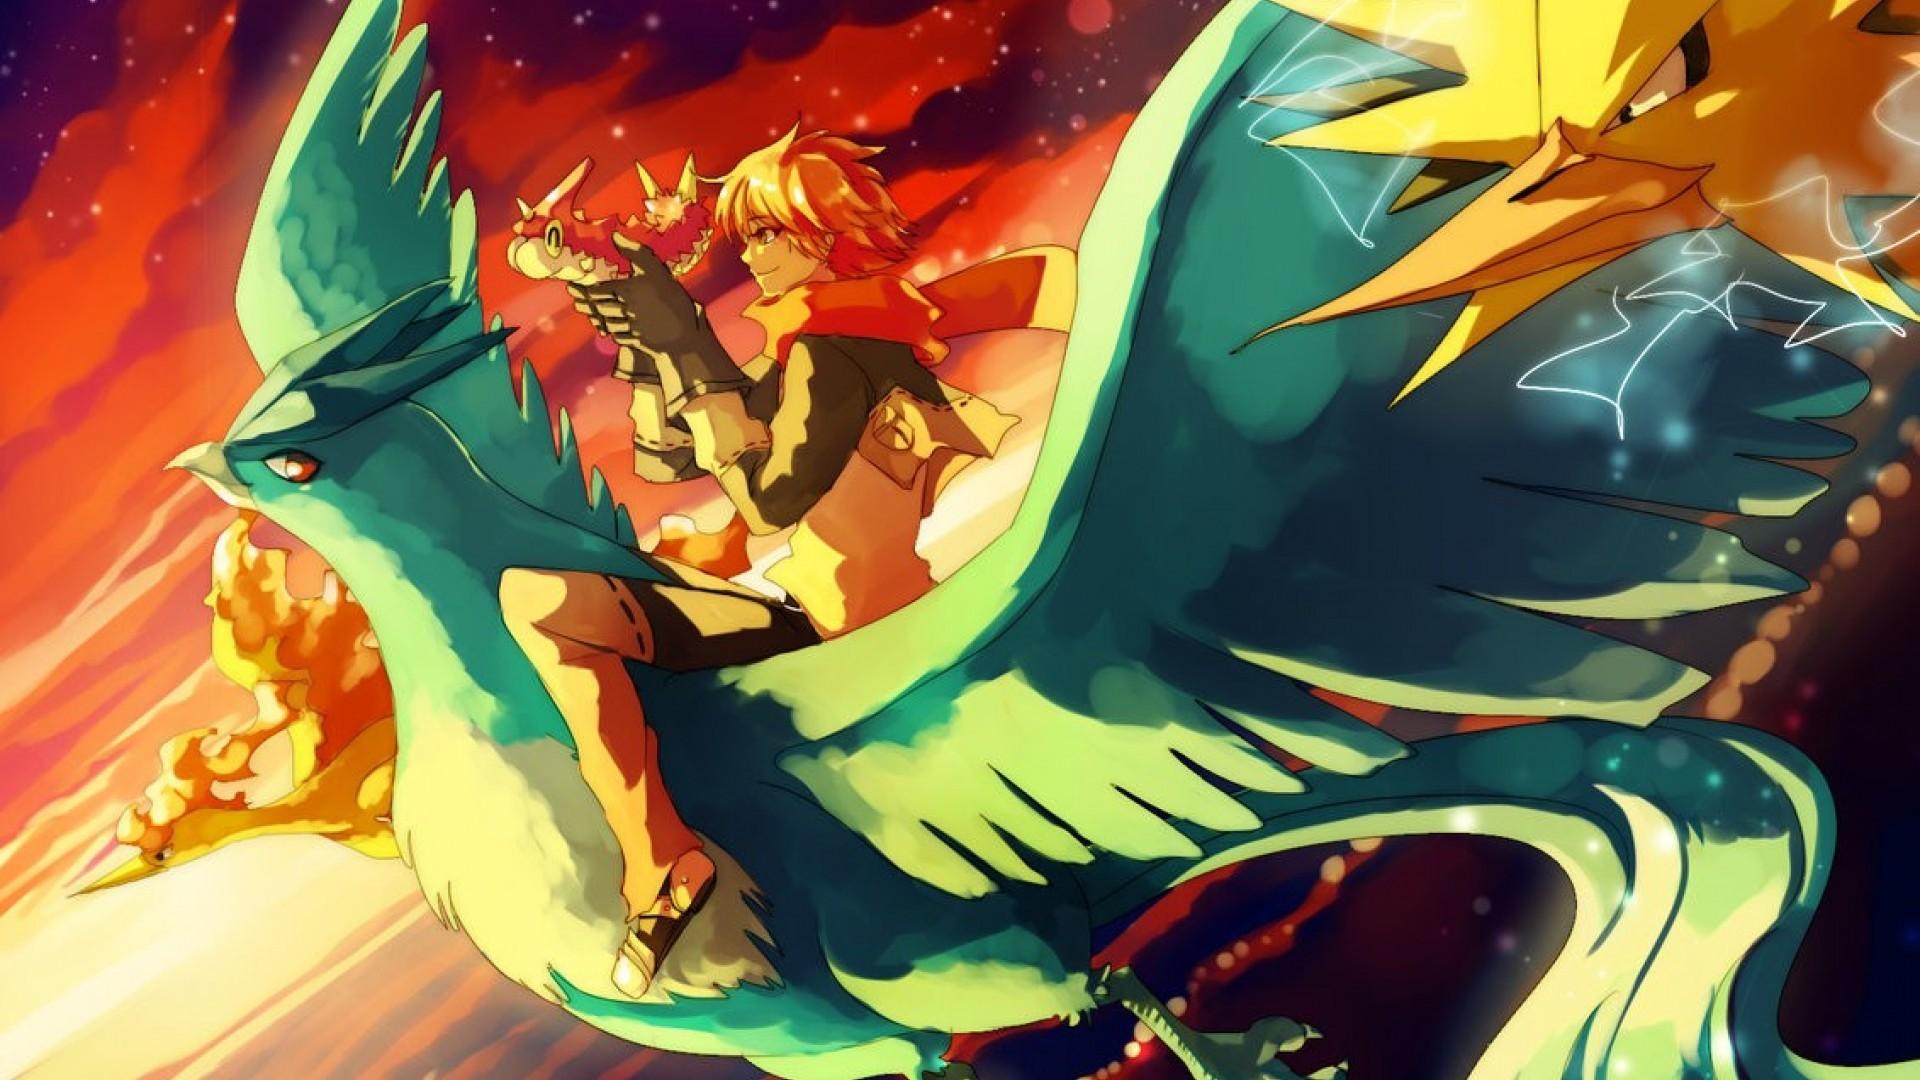 Unduh 4400 Wallpaper Hd Anime Pokemon Gratis Terbaik